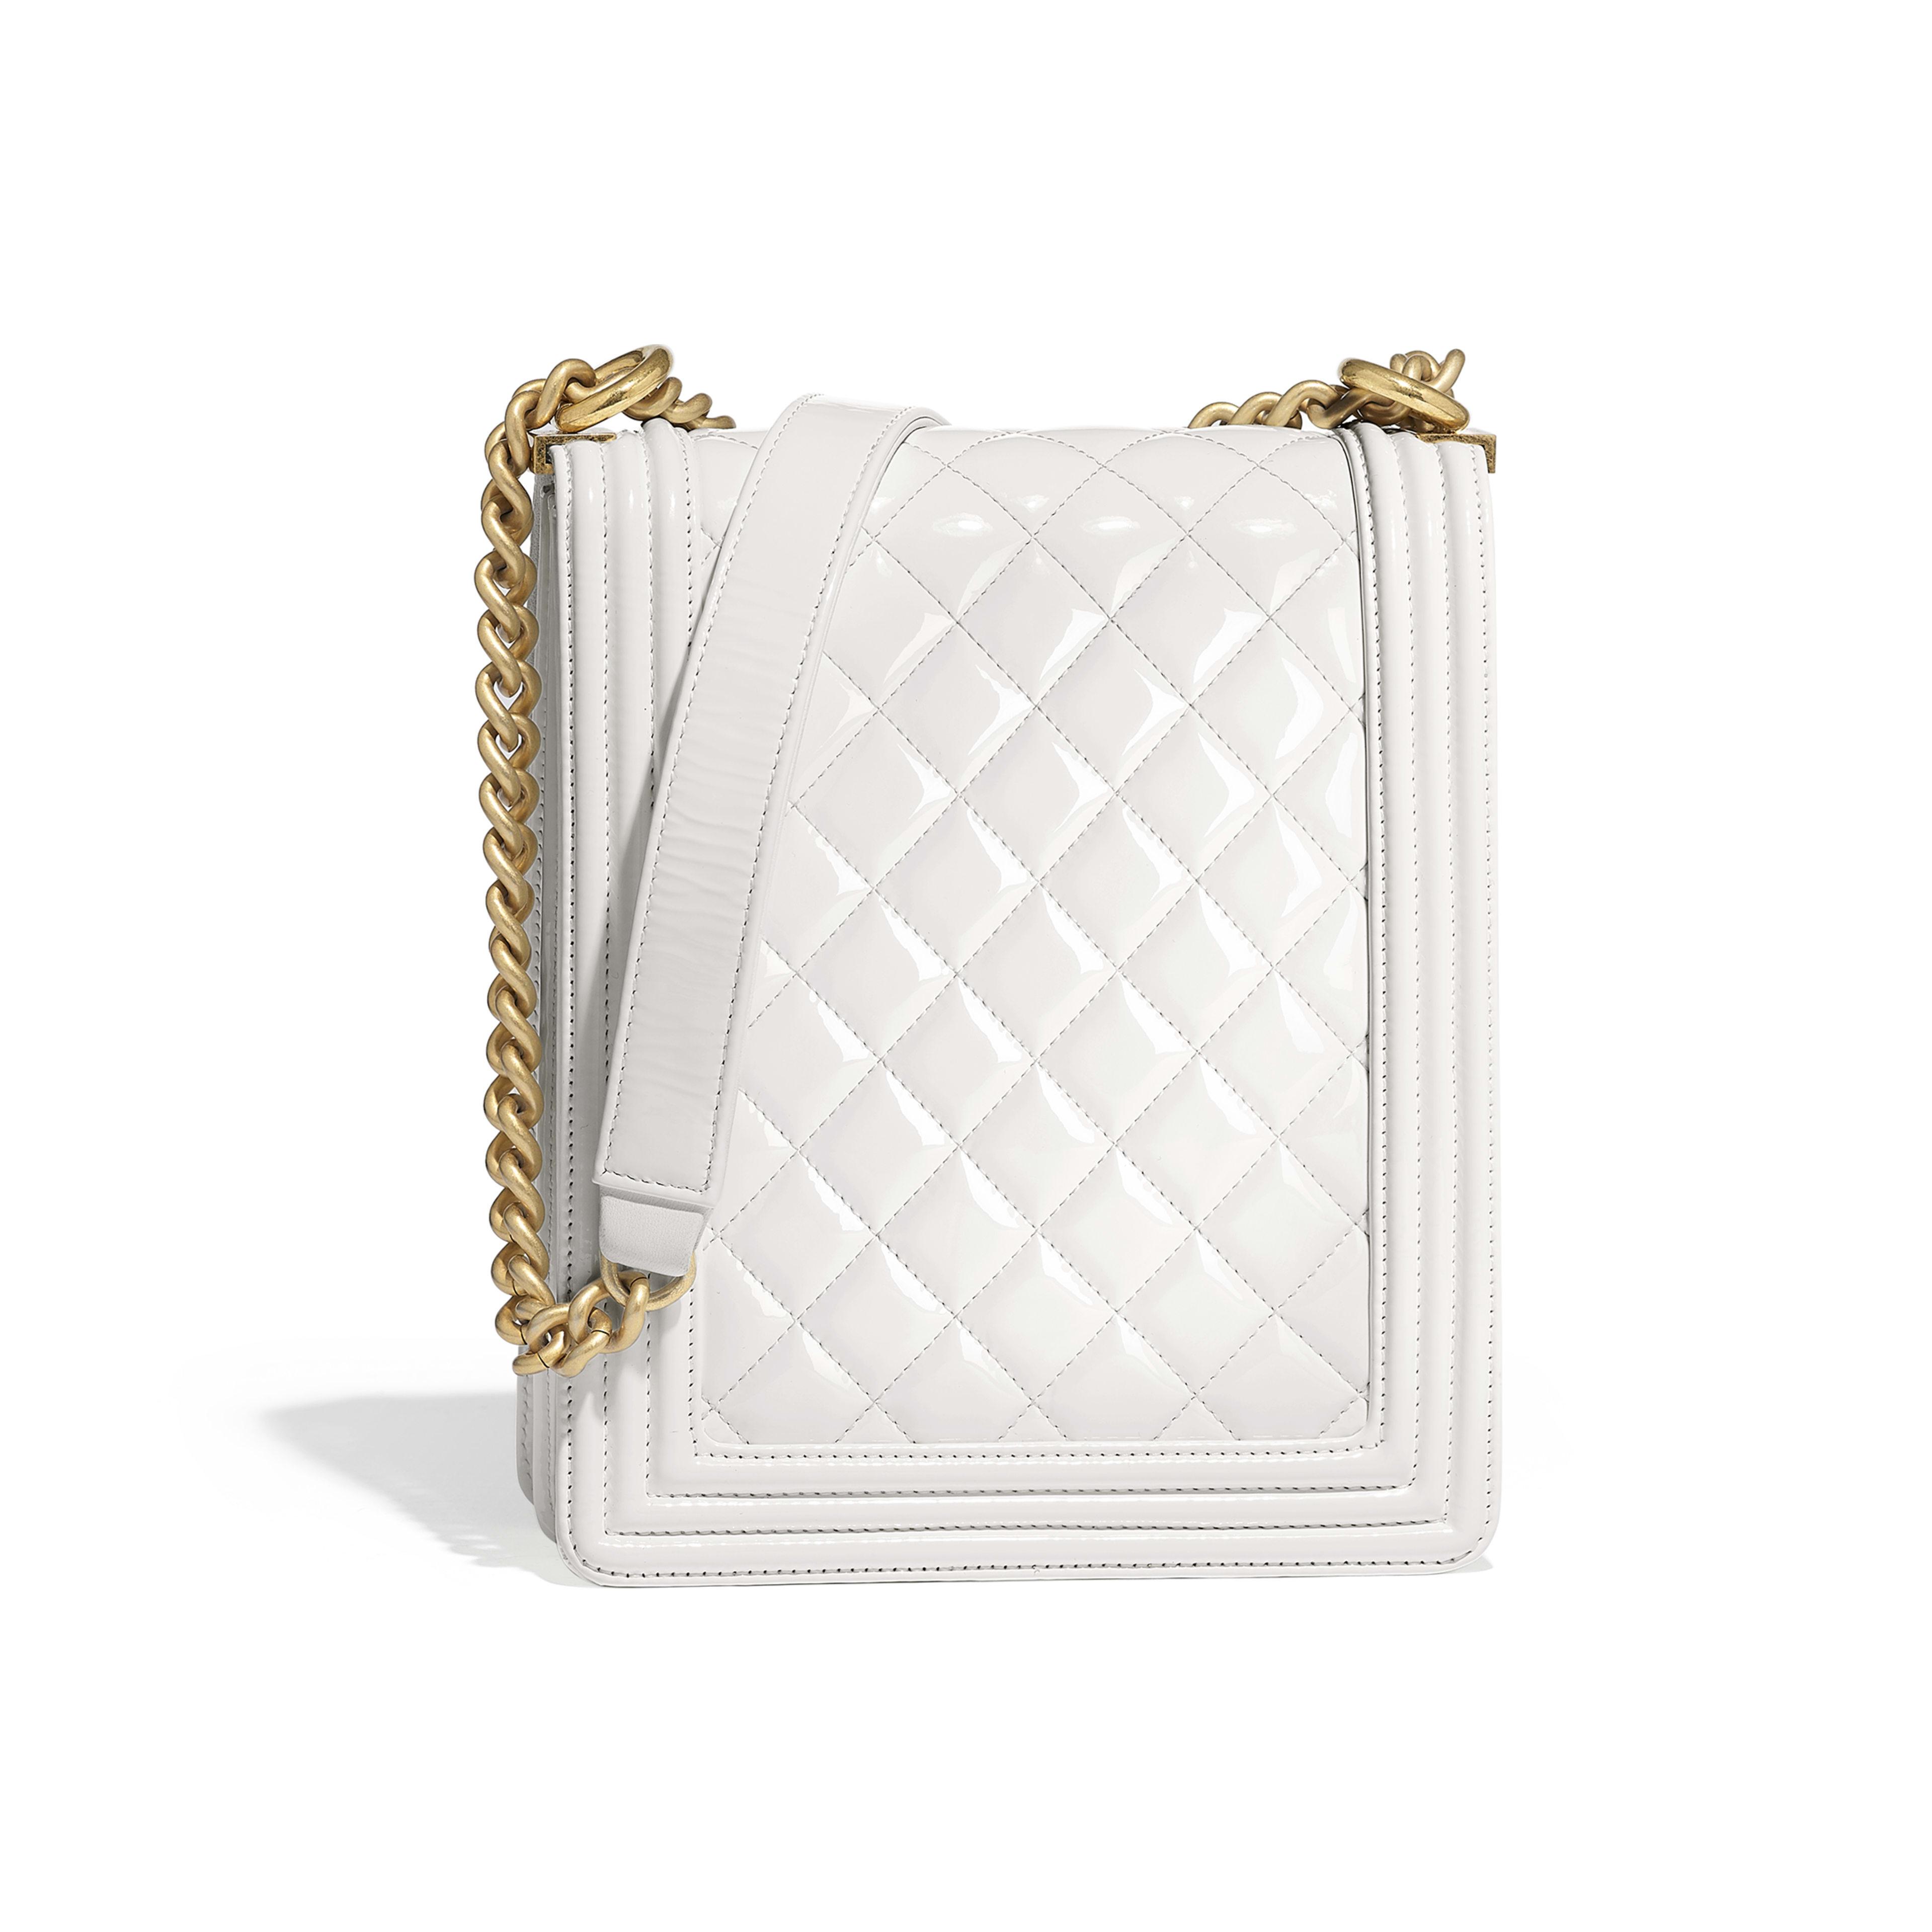 BOY CHANEL Handbag - White - Patent Calfskin & Gold-Tone Metal - Alternative view - see full sized version